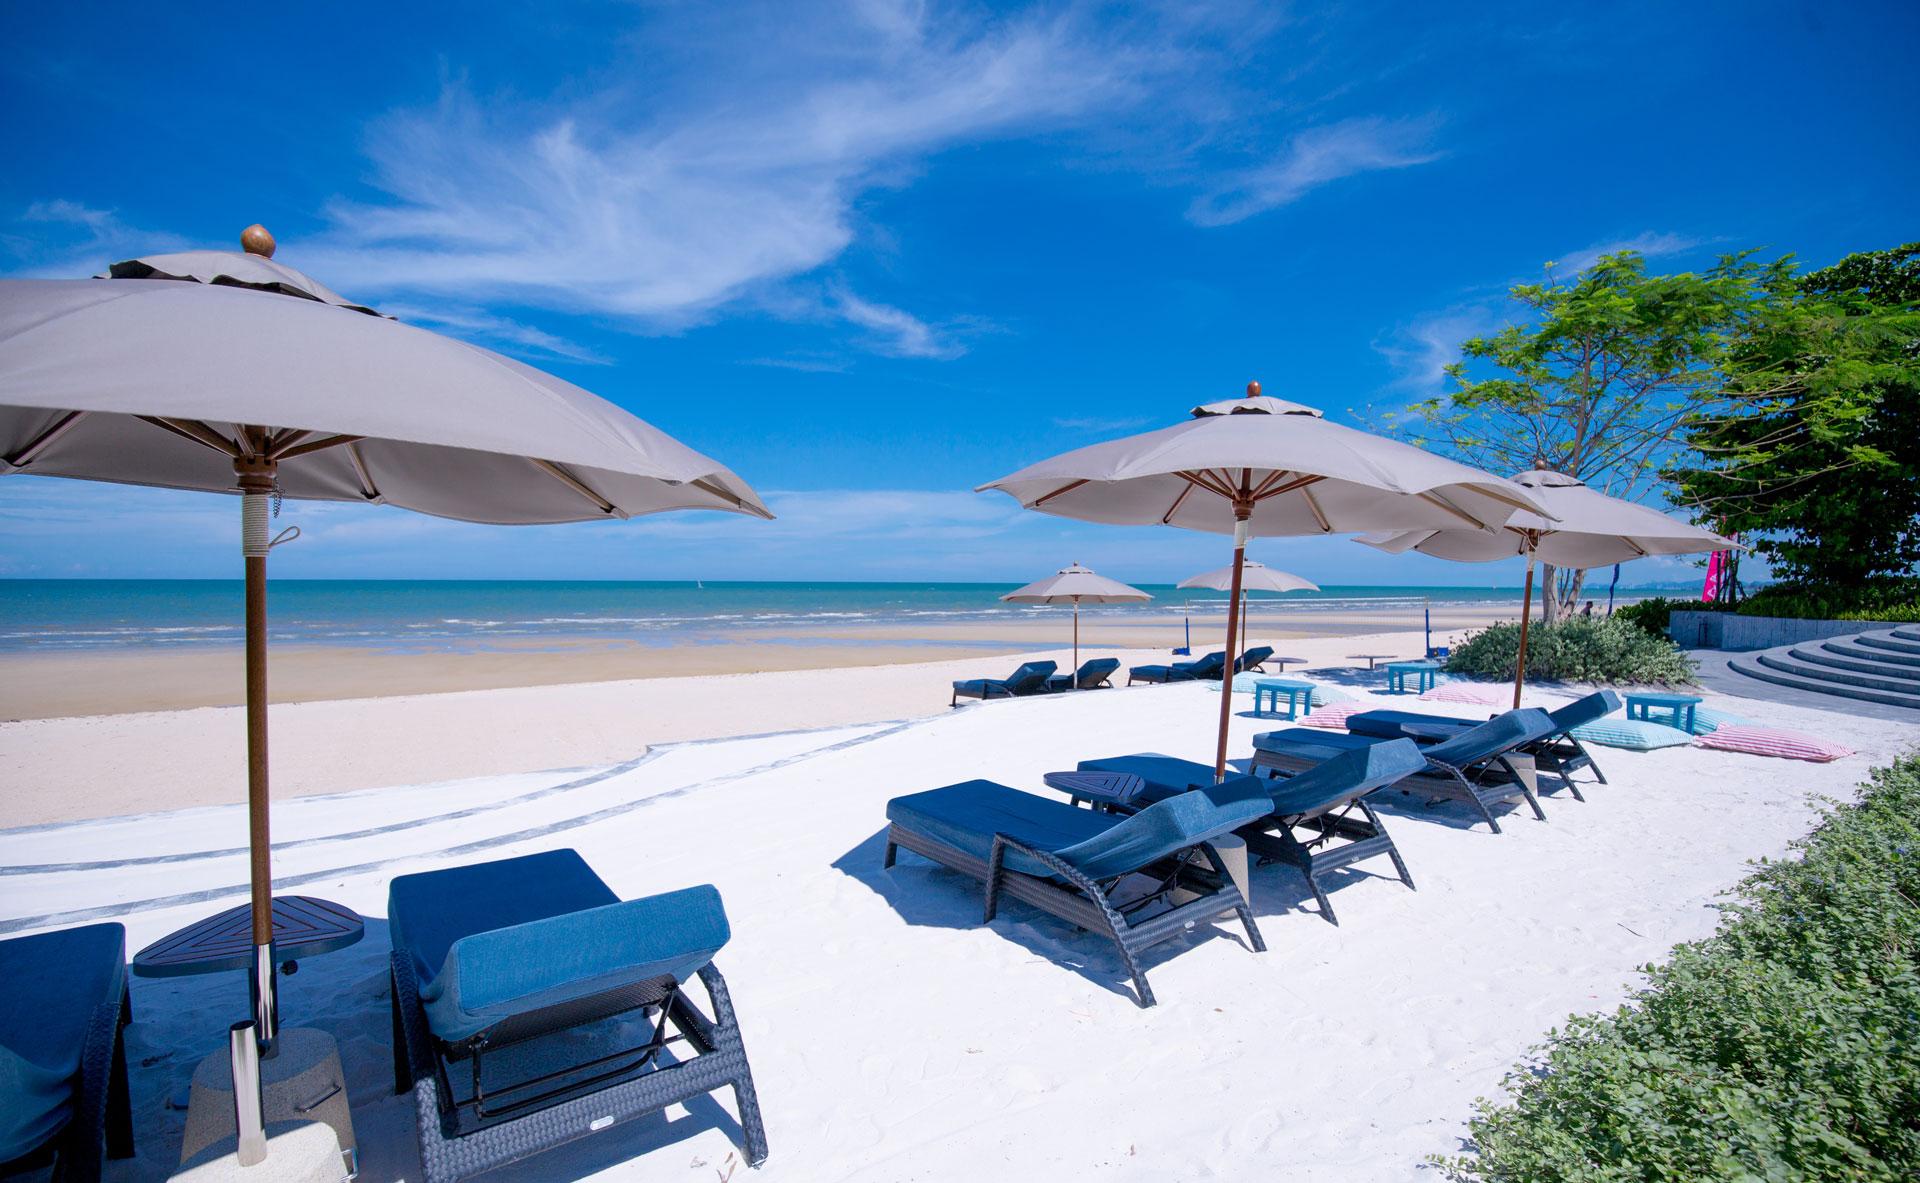 A Unique Hua Hin Beach Experience starting at a Luxury 5-Star Beachfront Hotel!